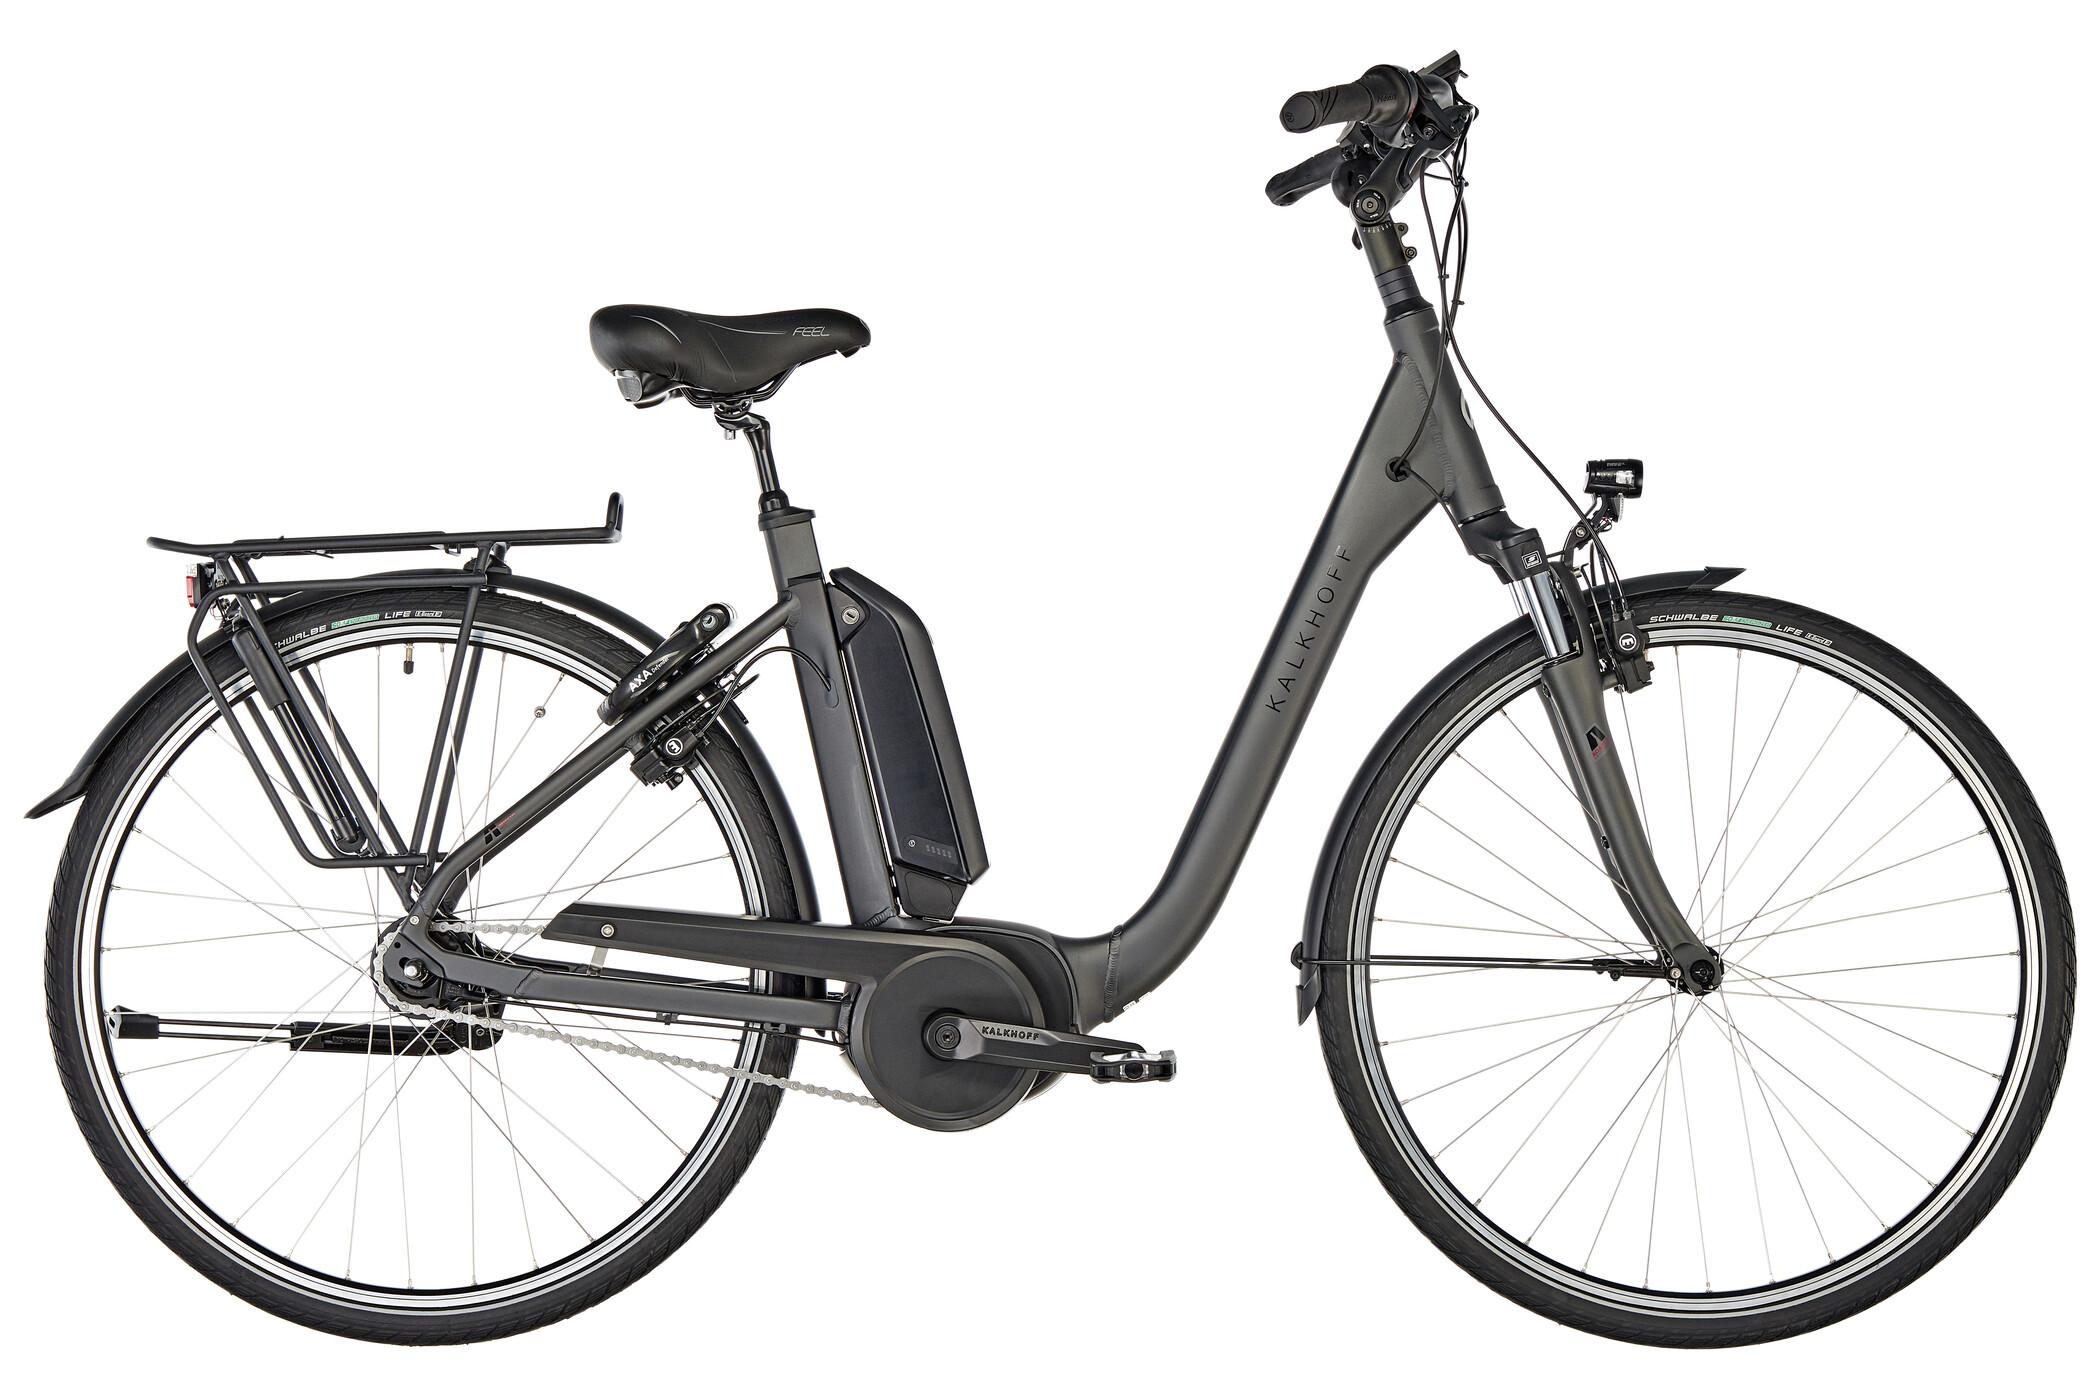 Kalkhoff Agattu B7 Move Comfort 400Wh, diamondblack matt | City-cykler